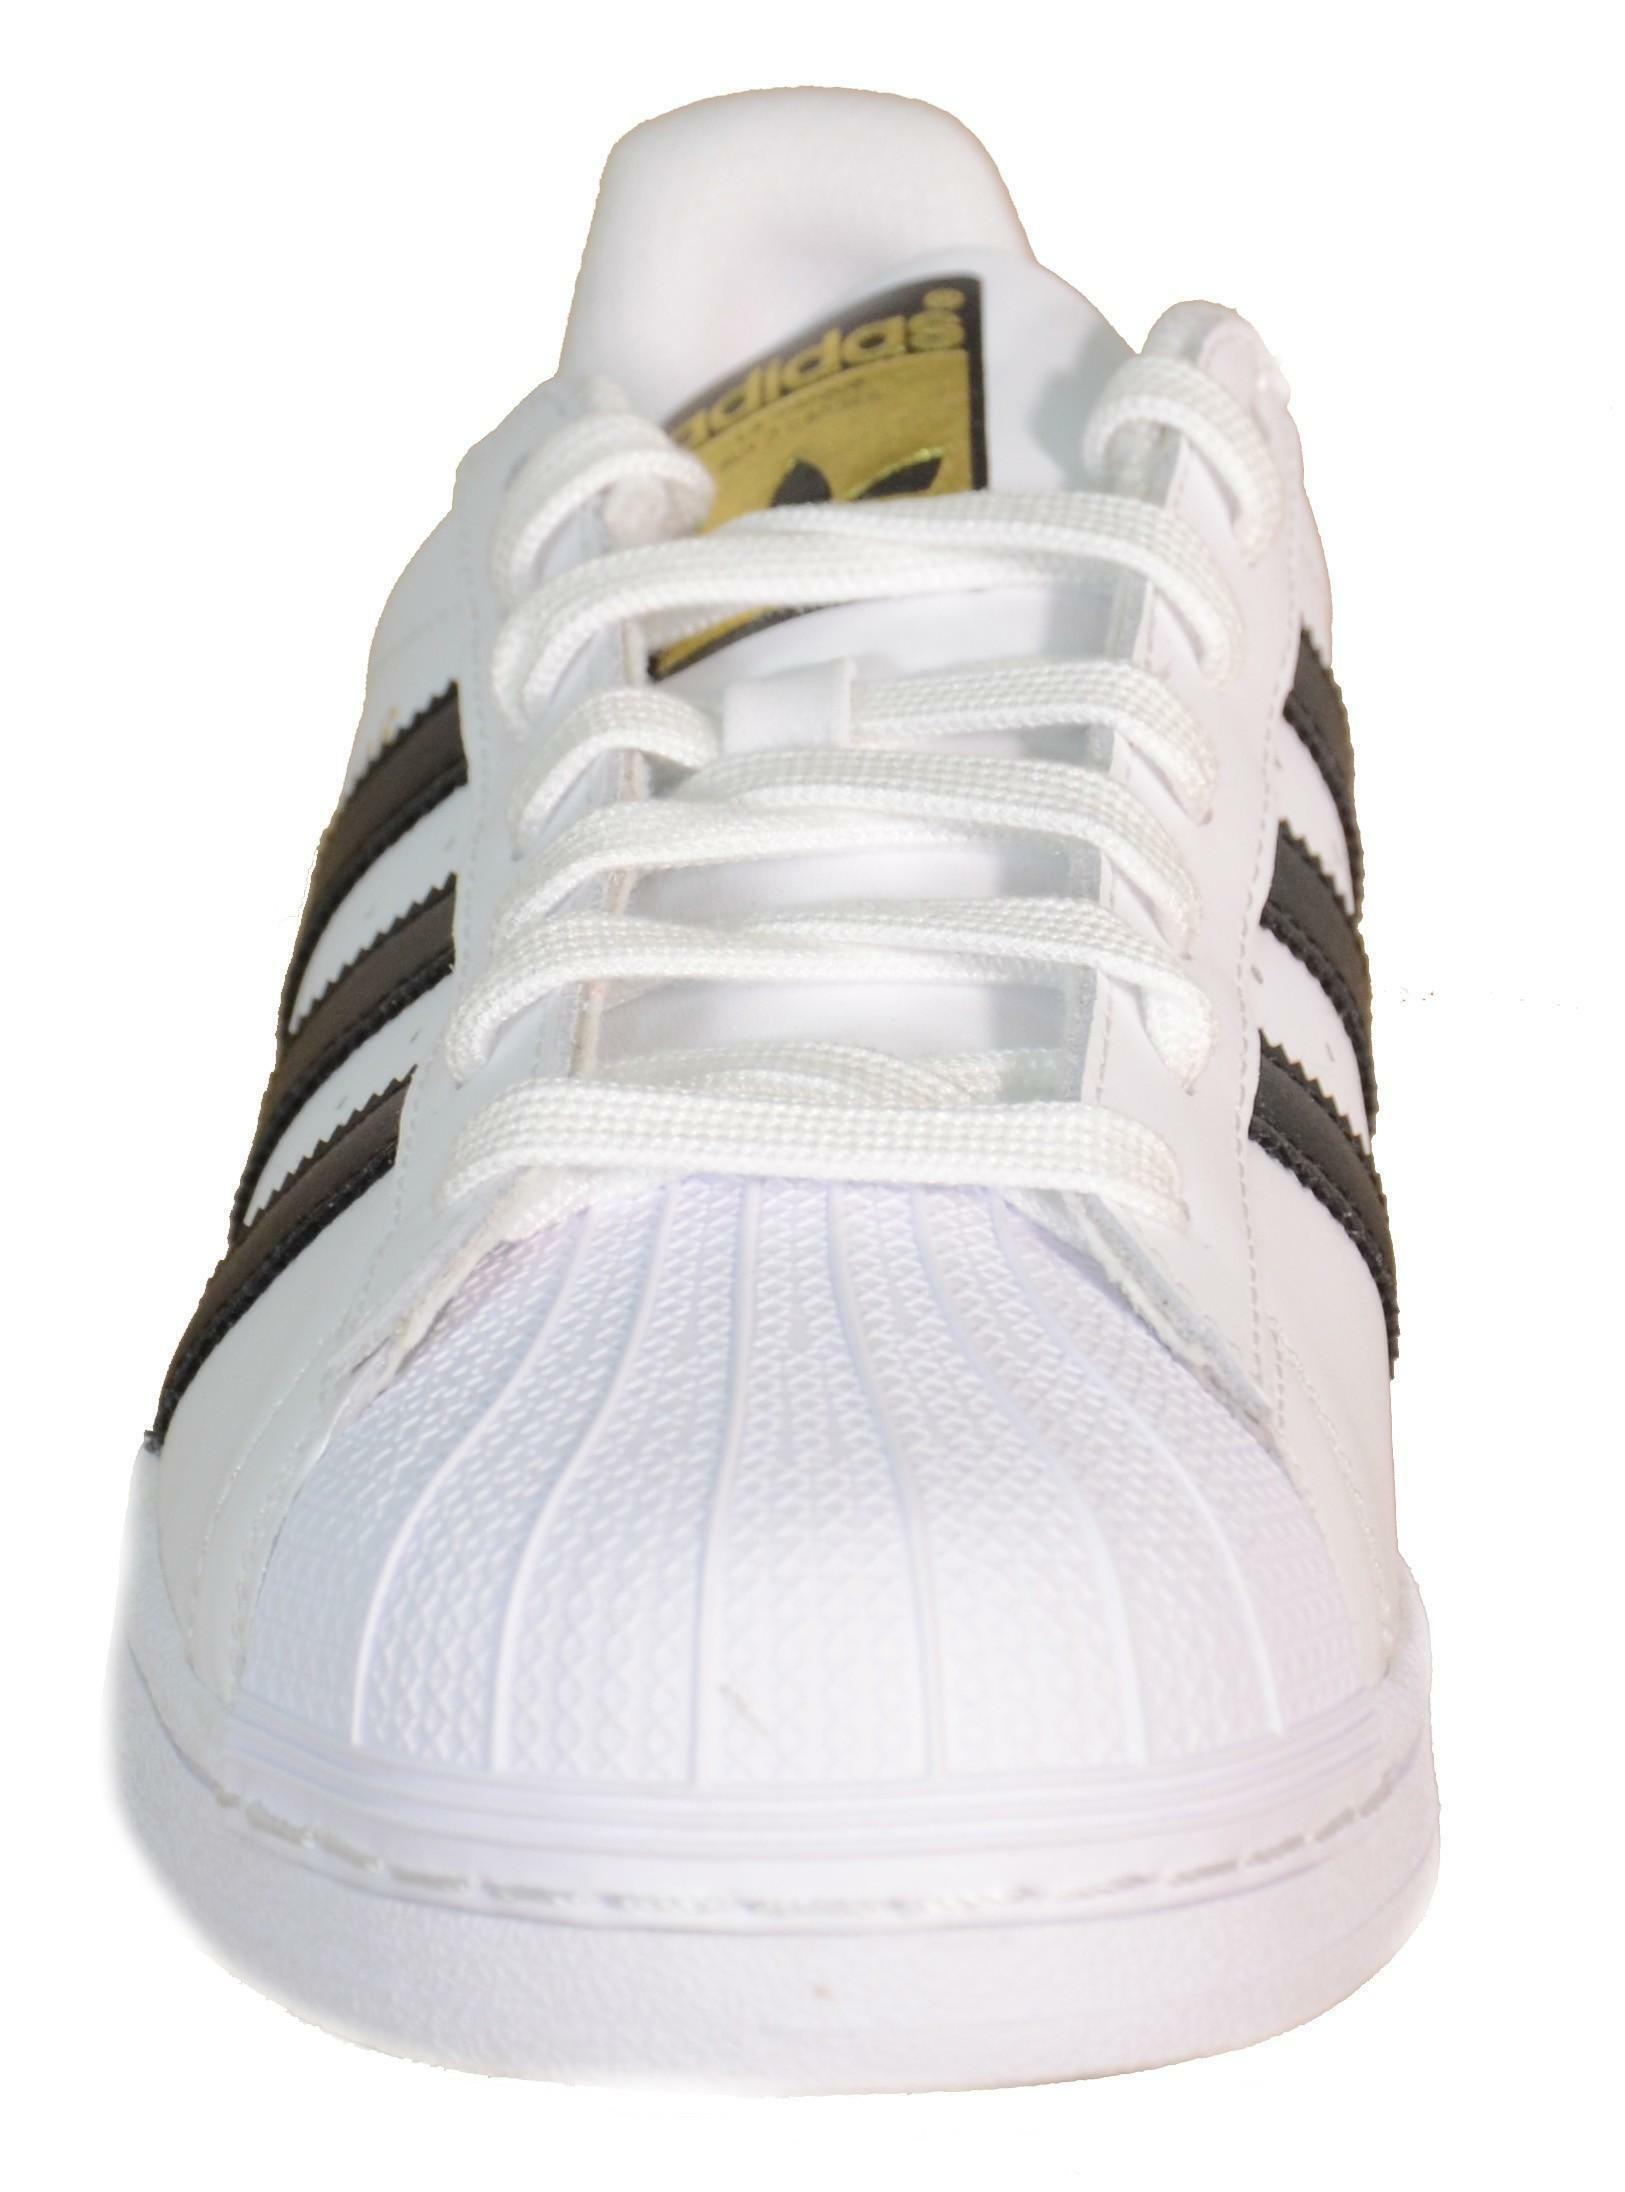 adidas adidas superstar scarpe bianche unisex pelle c77124